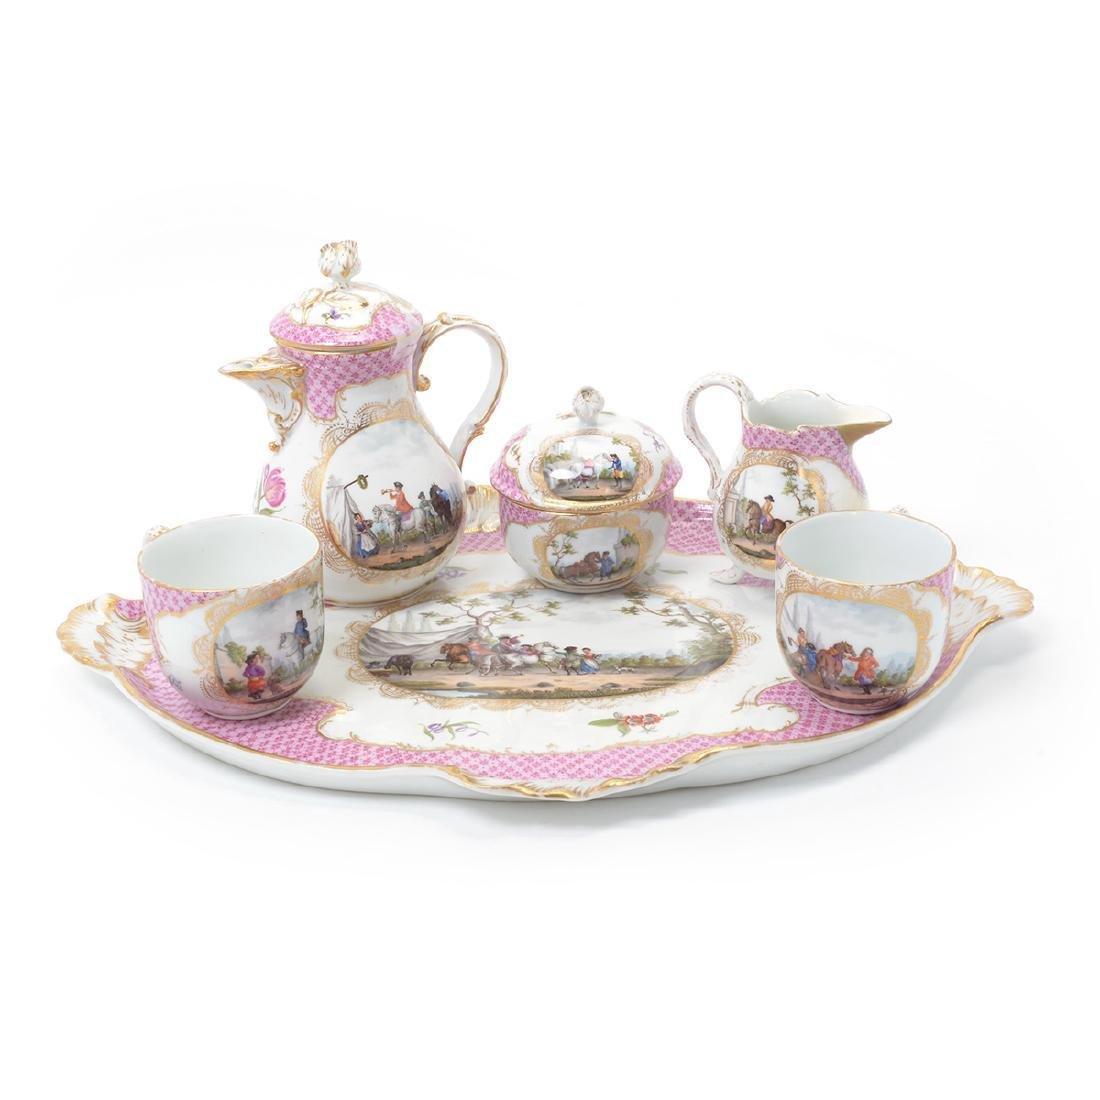 Meissen Six Piece Porcelain Tea Service including Tray